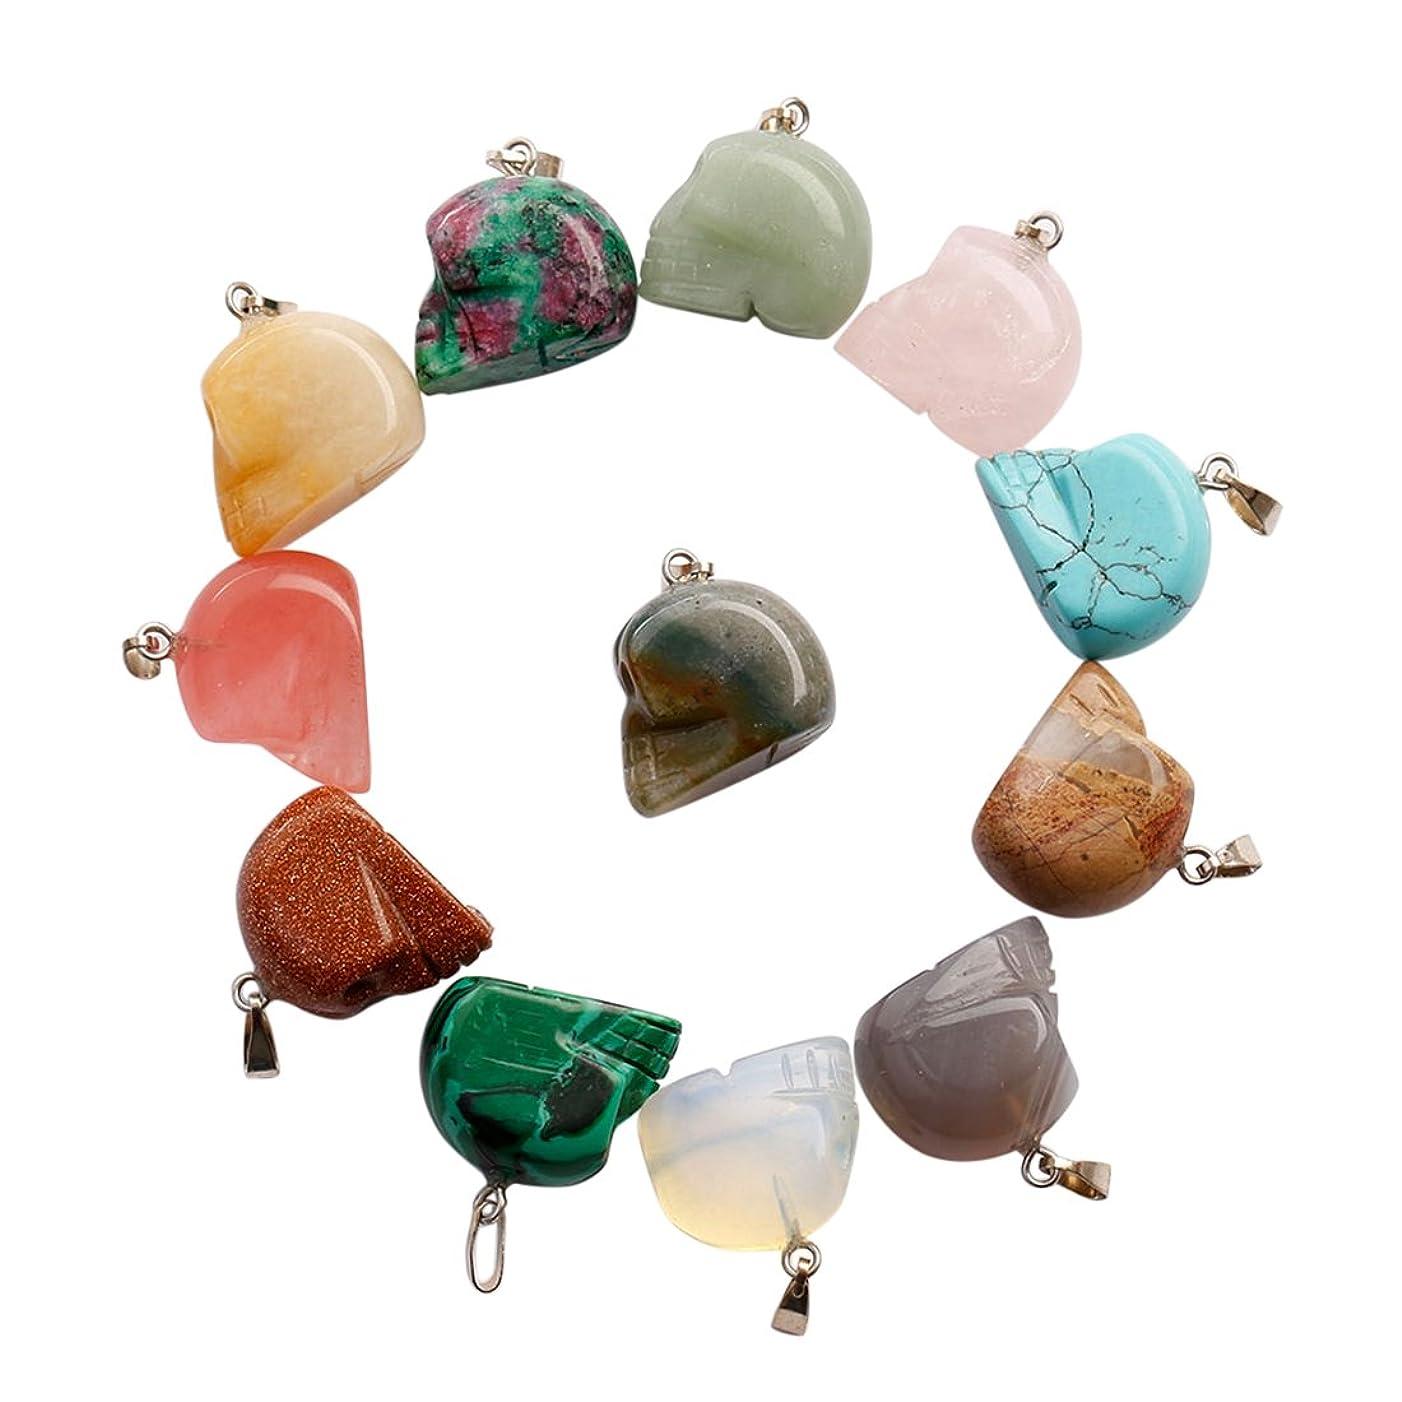 Animal Skull Head Charms Pendant Healing Crystal Quartz Chakra Beads for DIY Jewelry Making (5)